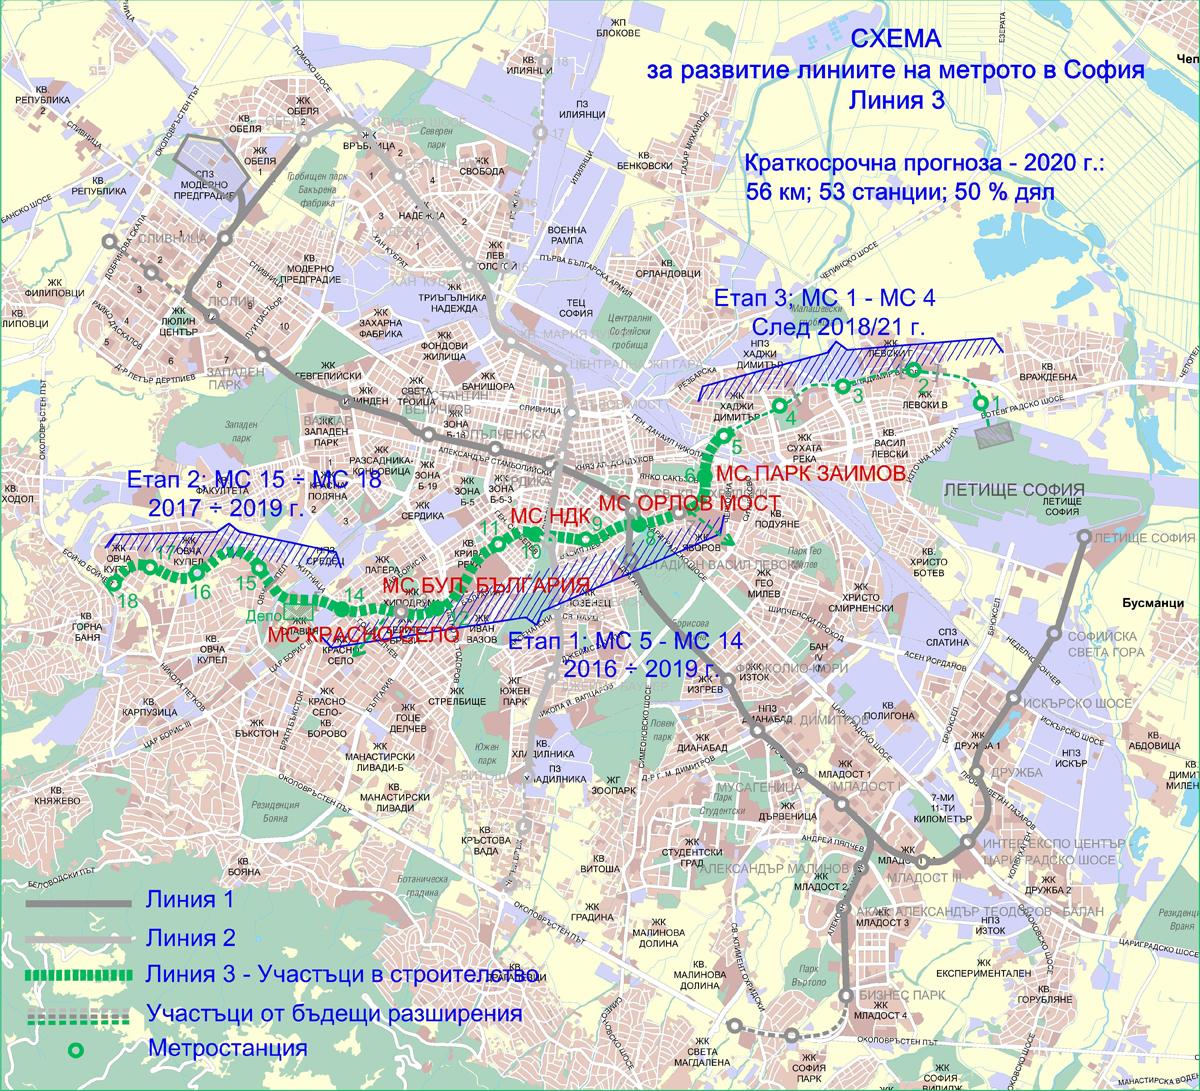 Liniya 3 Na Metroto V Sofiya Metropolitan Sofia